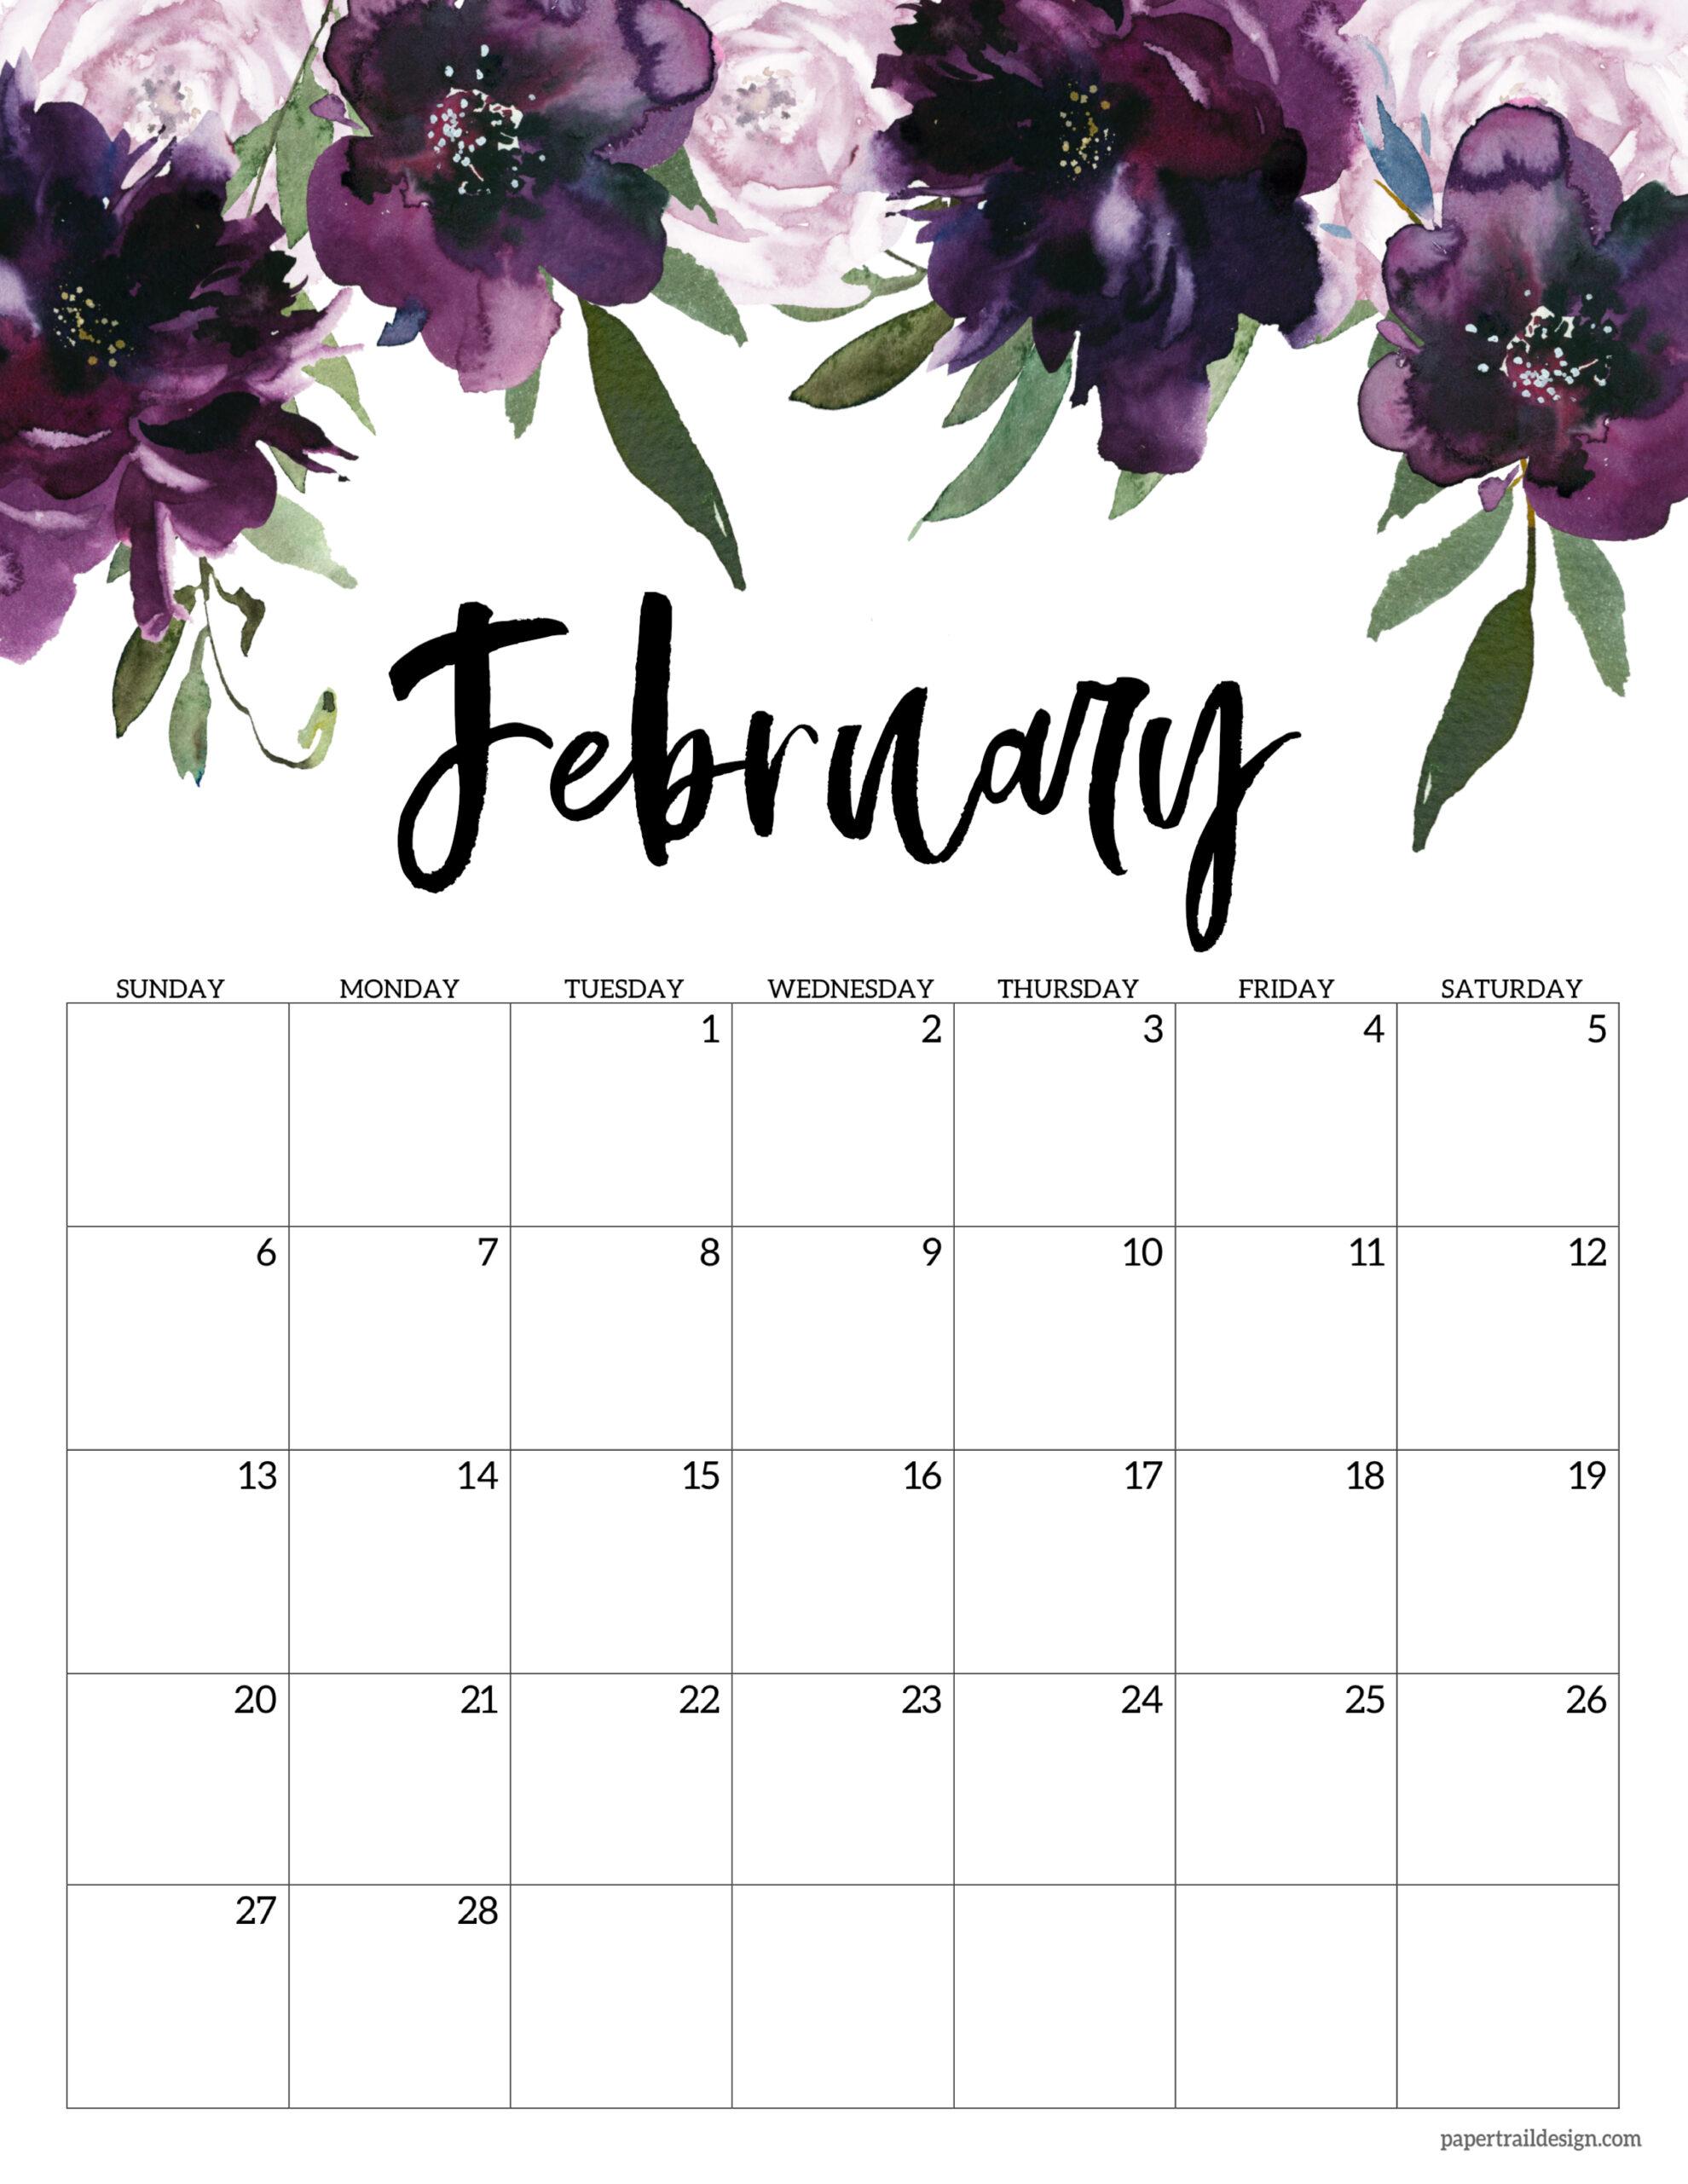 Calendar Feb 2022 Printable.Free 2022 Calendar Printable Floral Paper Trail Design